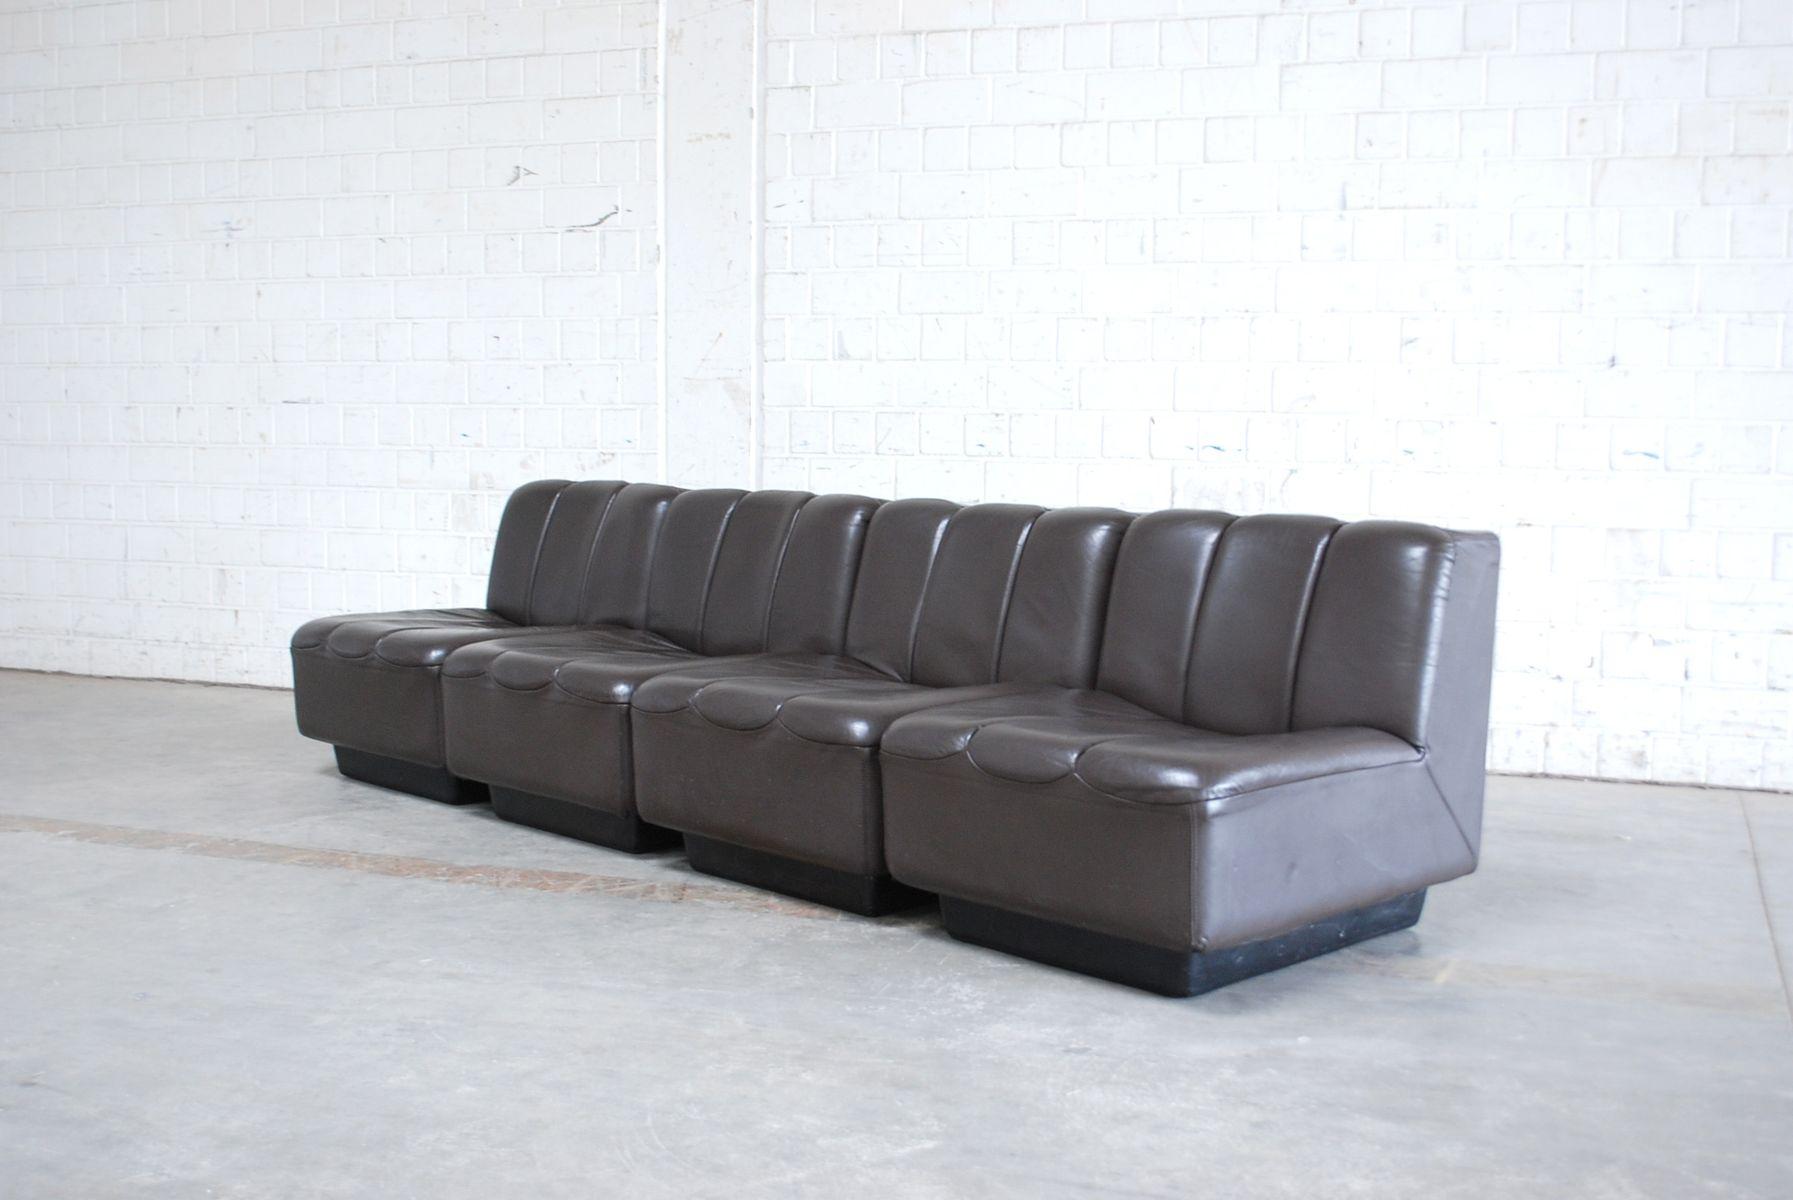 vintage modular brown leather sofa 1970s for sale at pamono. Black Bedroom Furniture Sets. Home Design Ideas